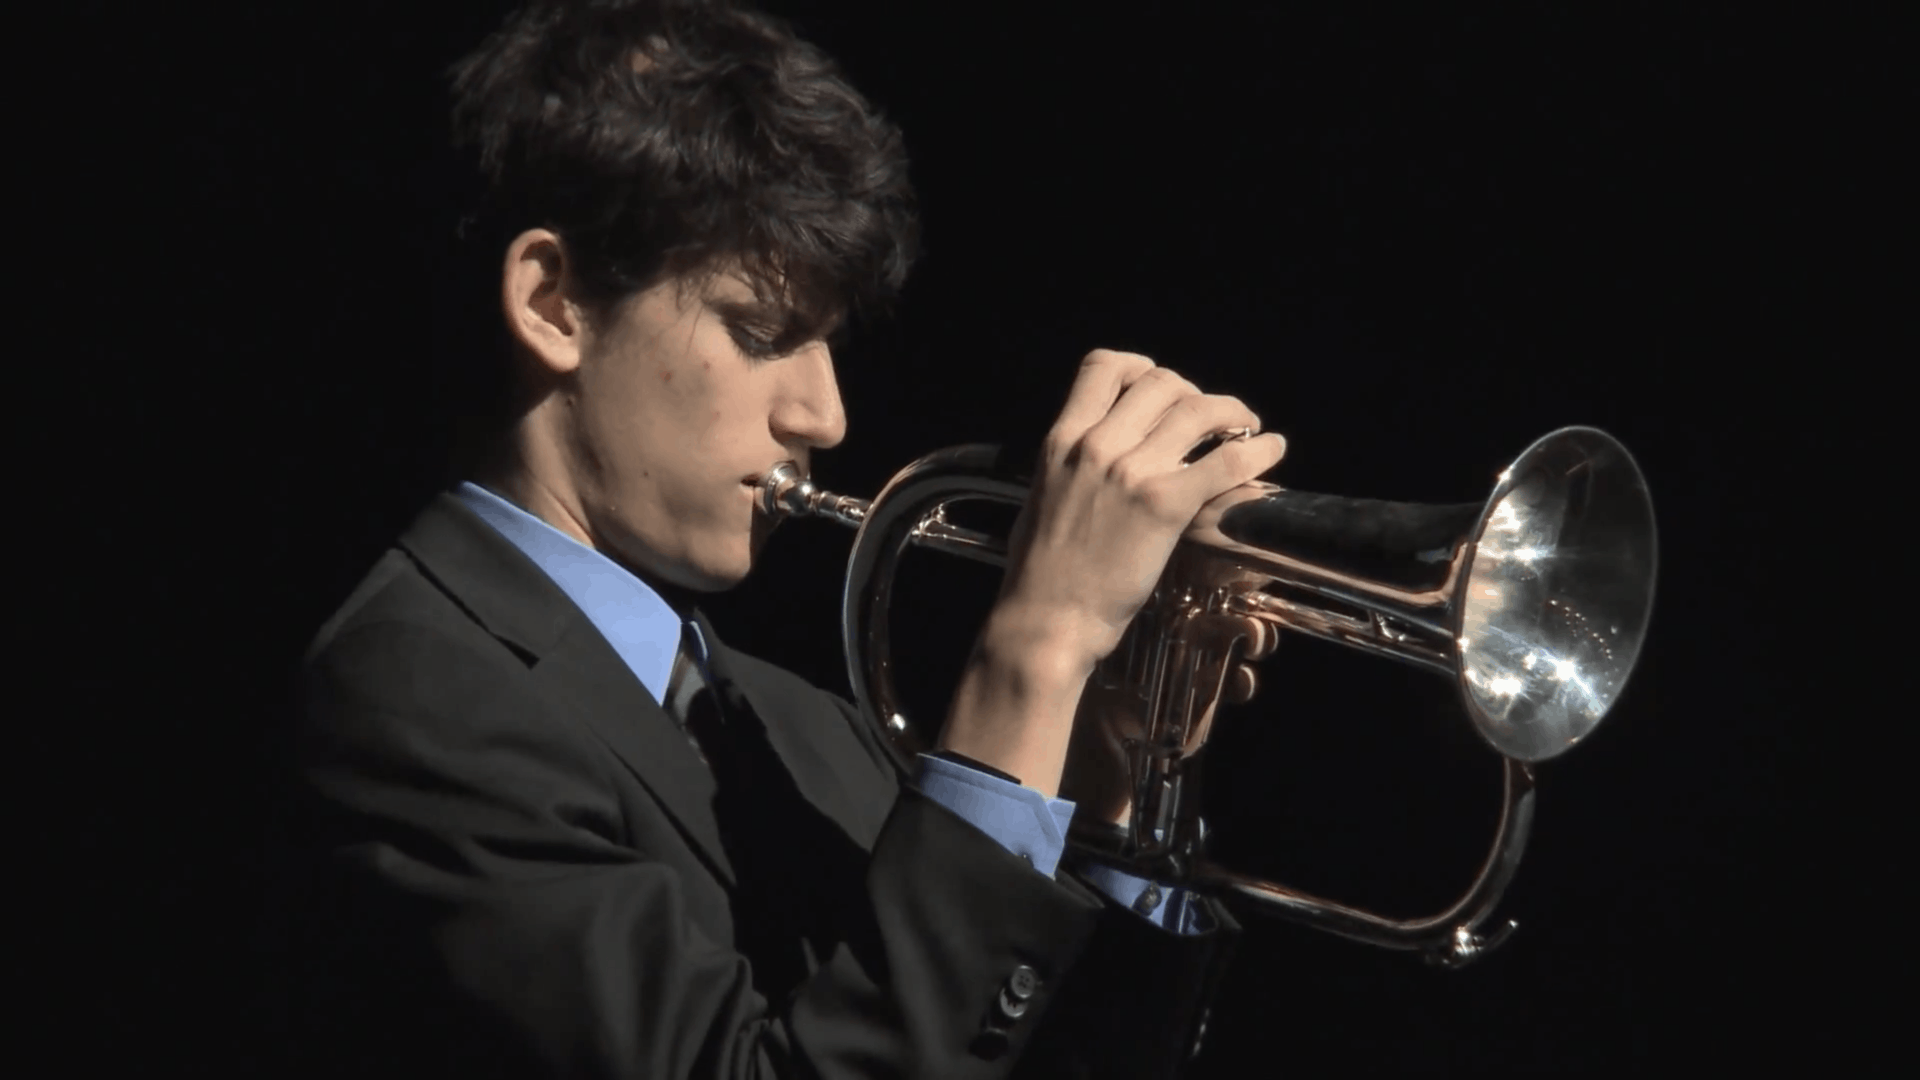 Trumpet player Joe Gullace